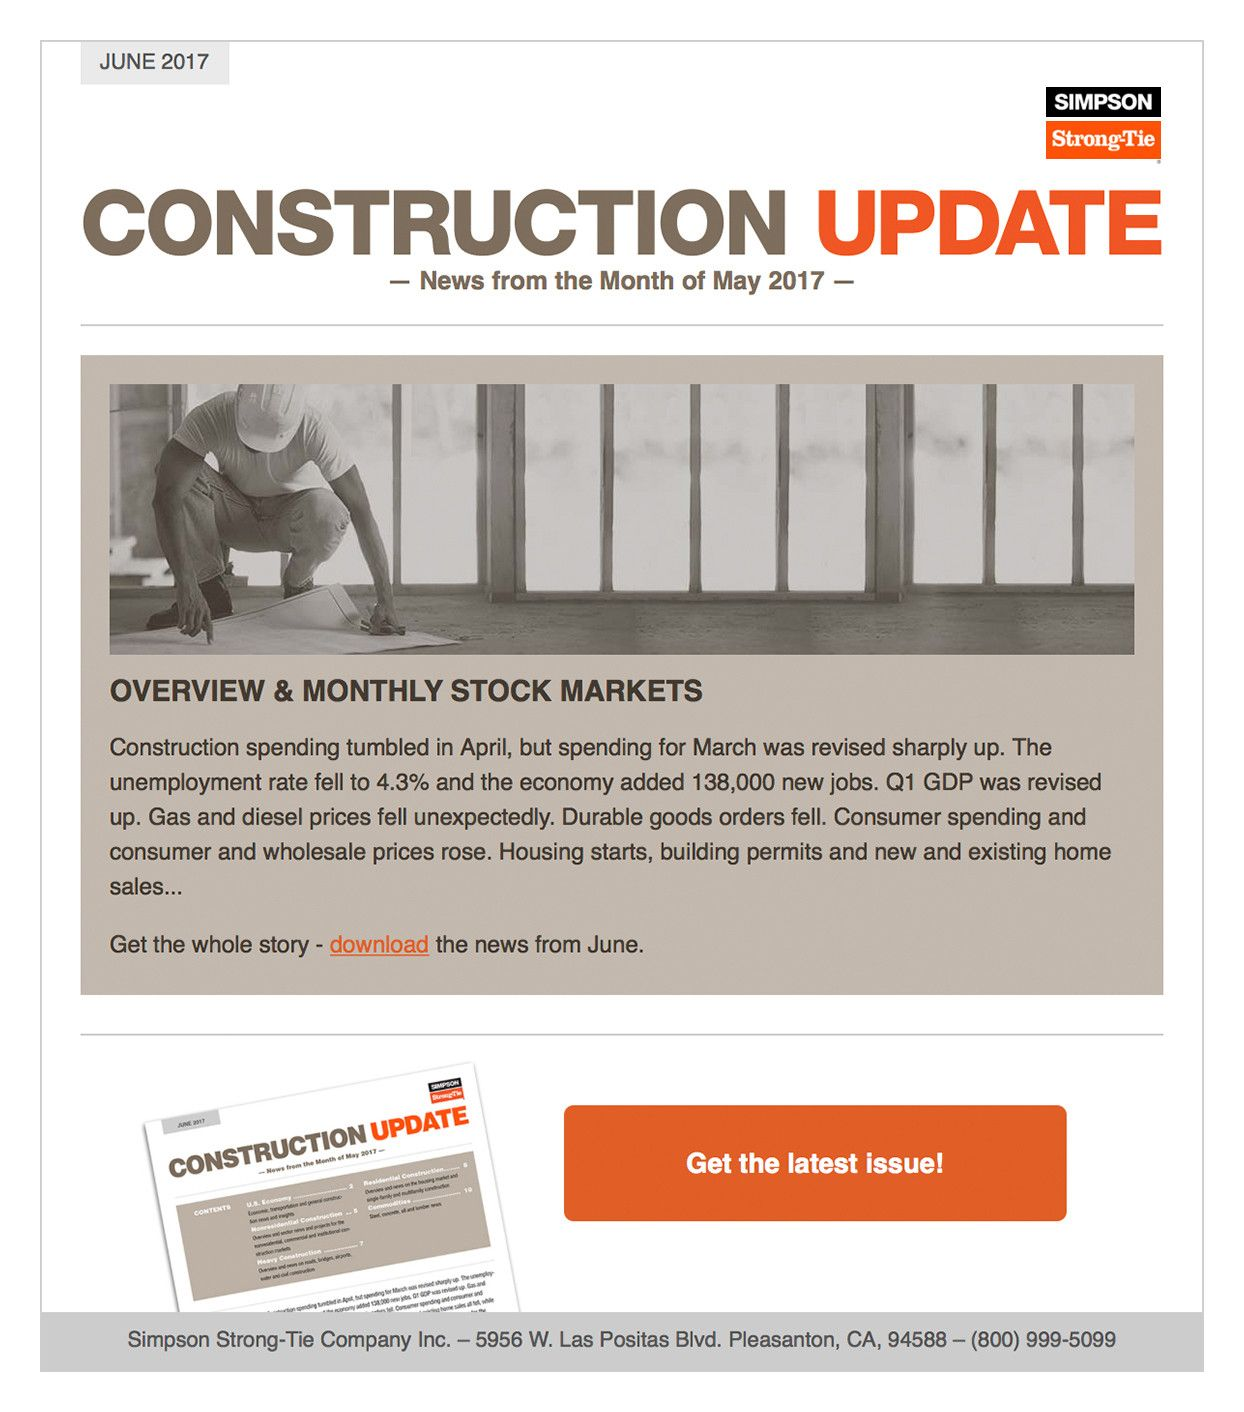 constructionupdate